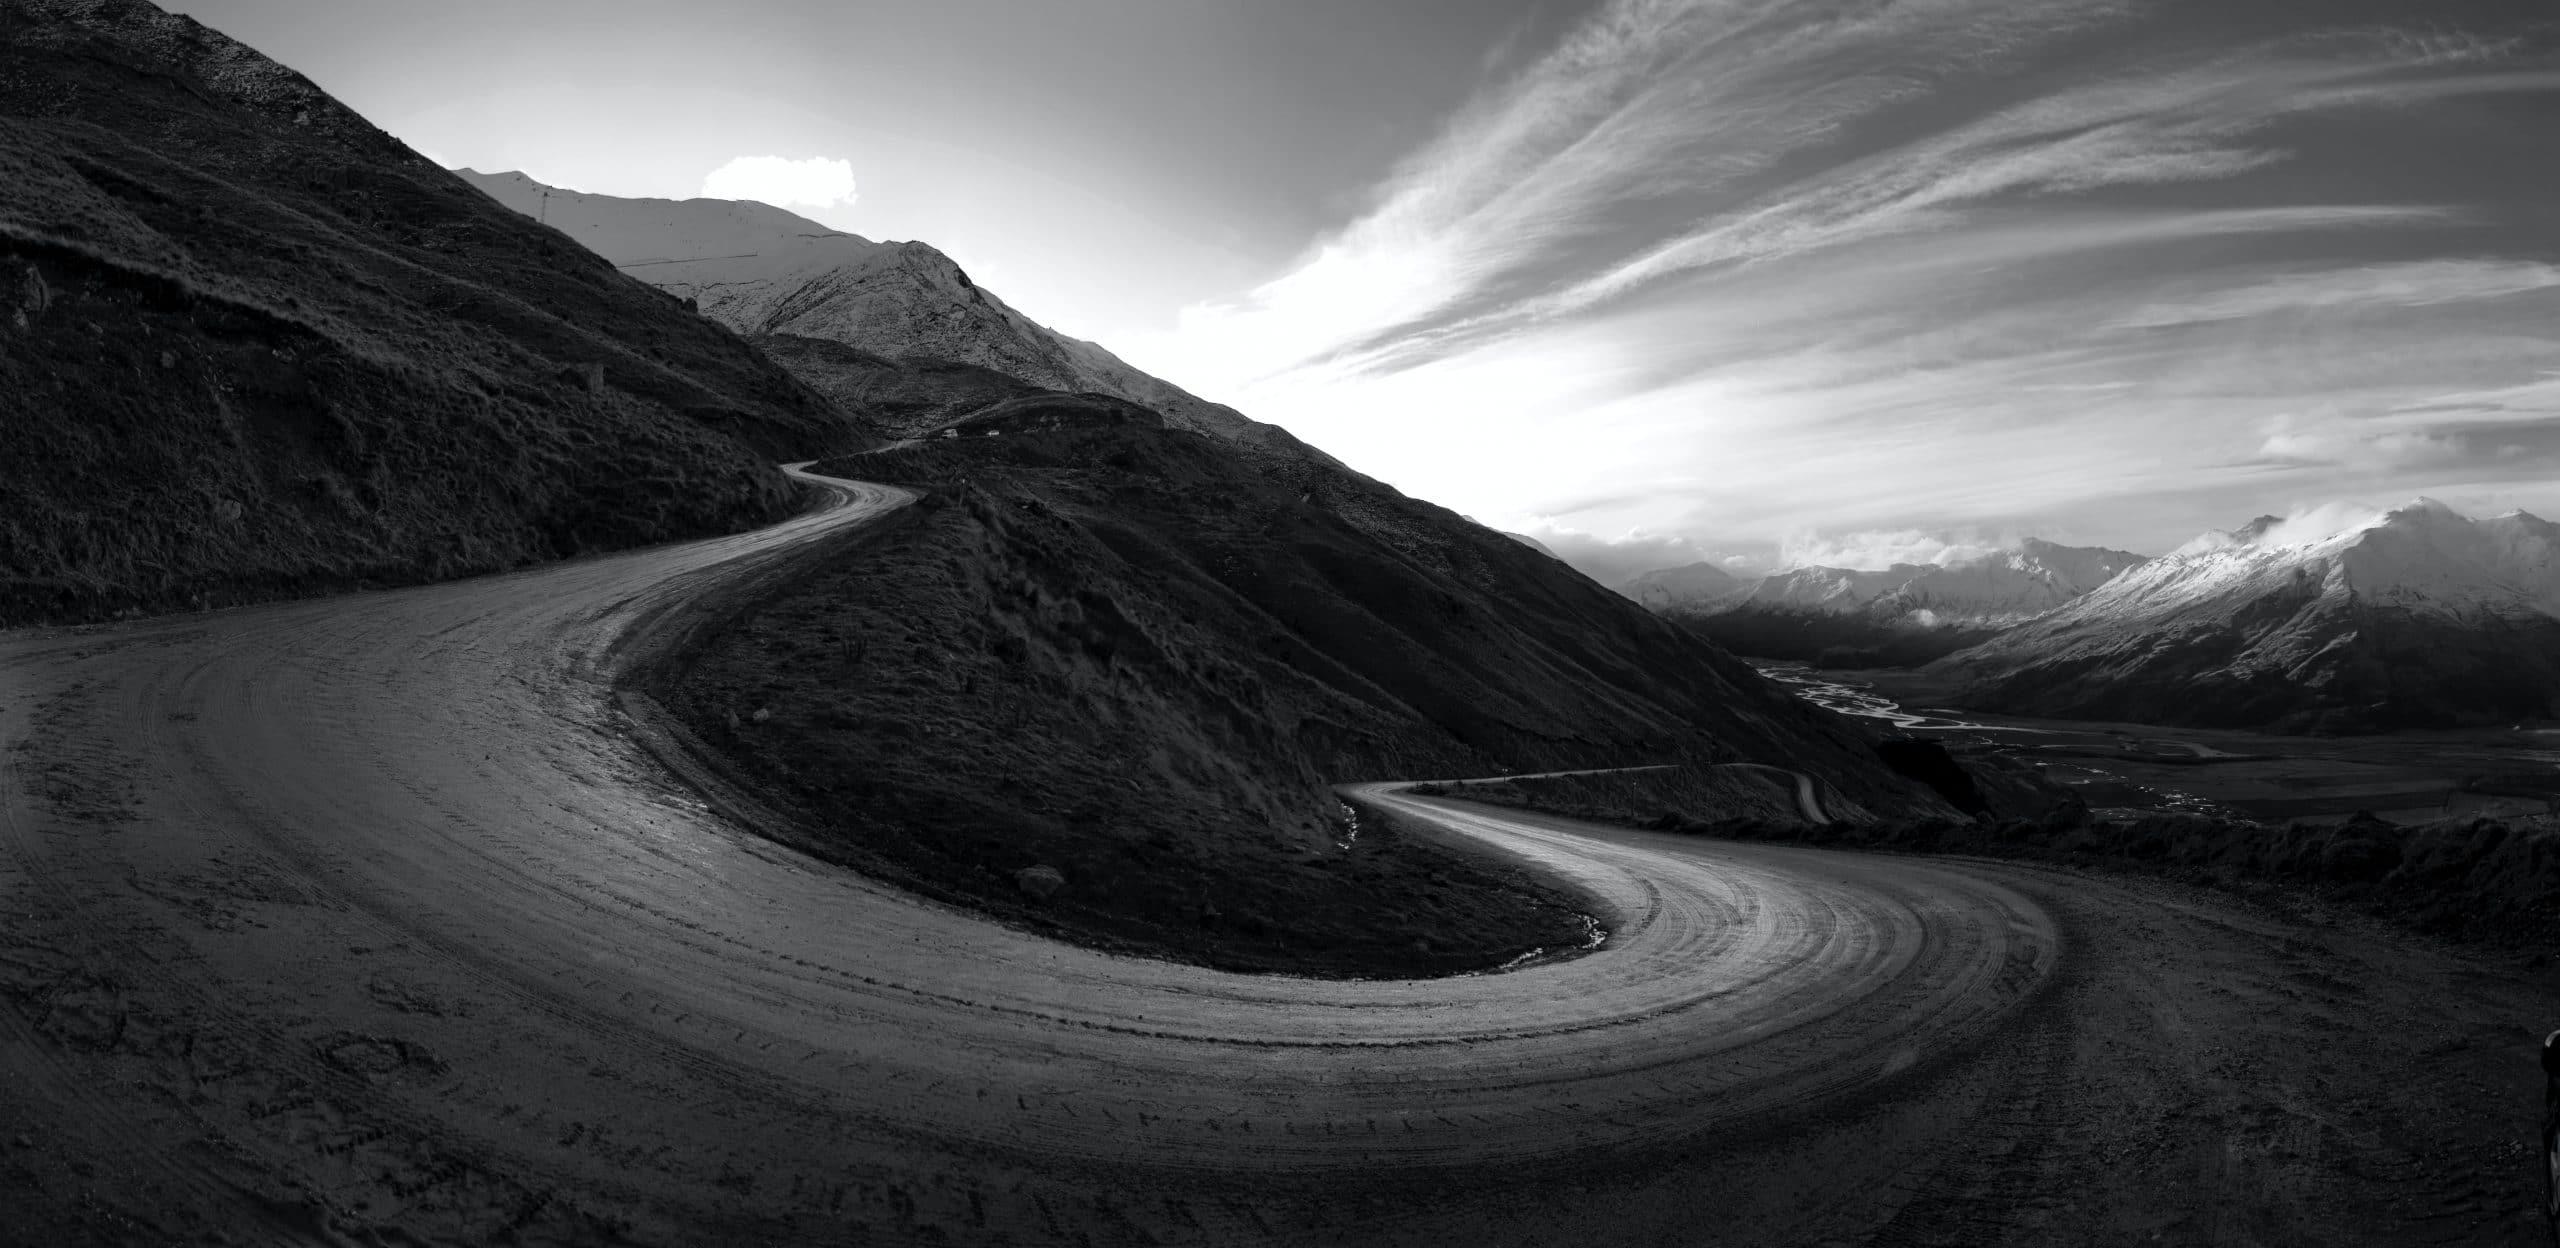 Una strada di montagna in ripida salita.